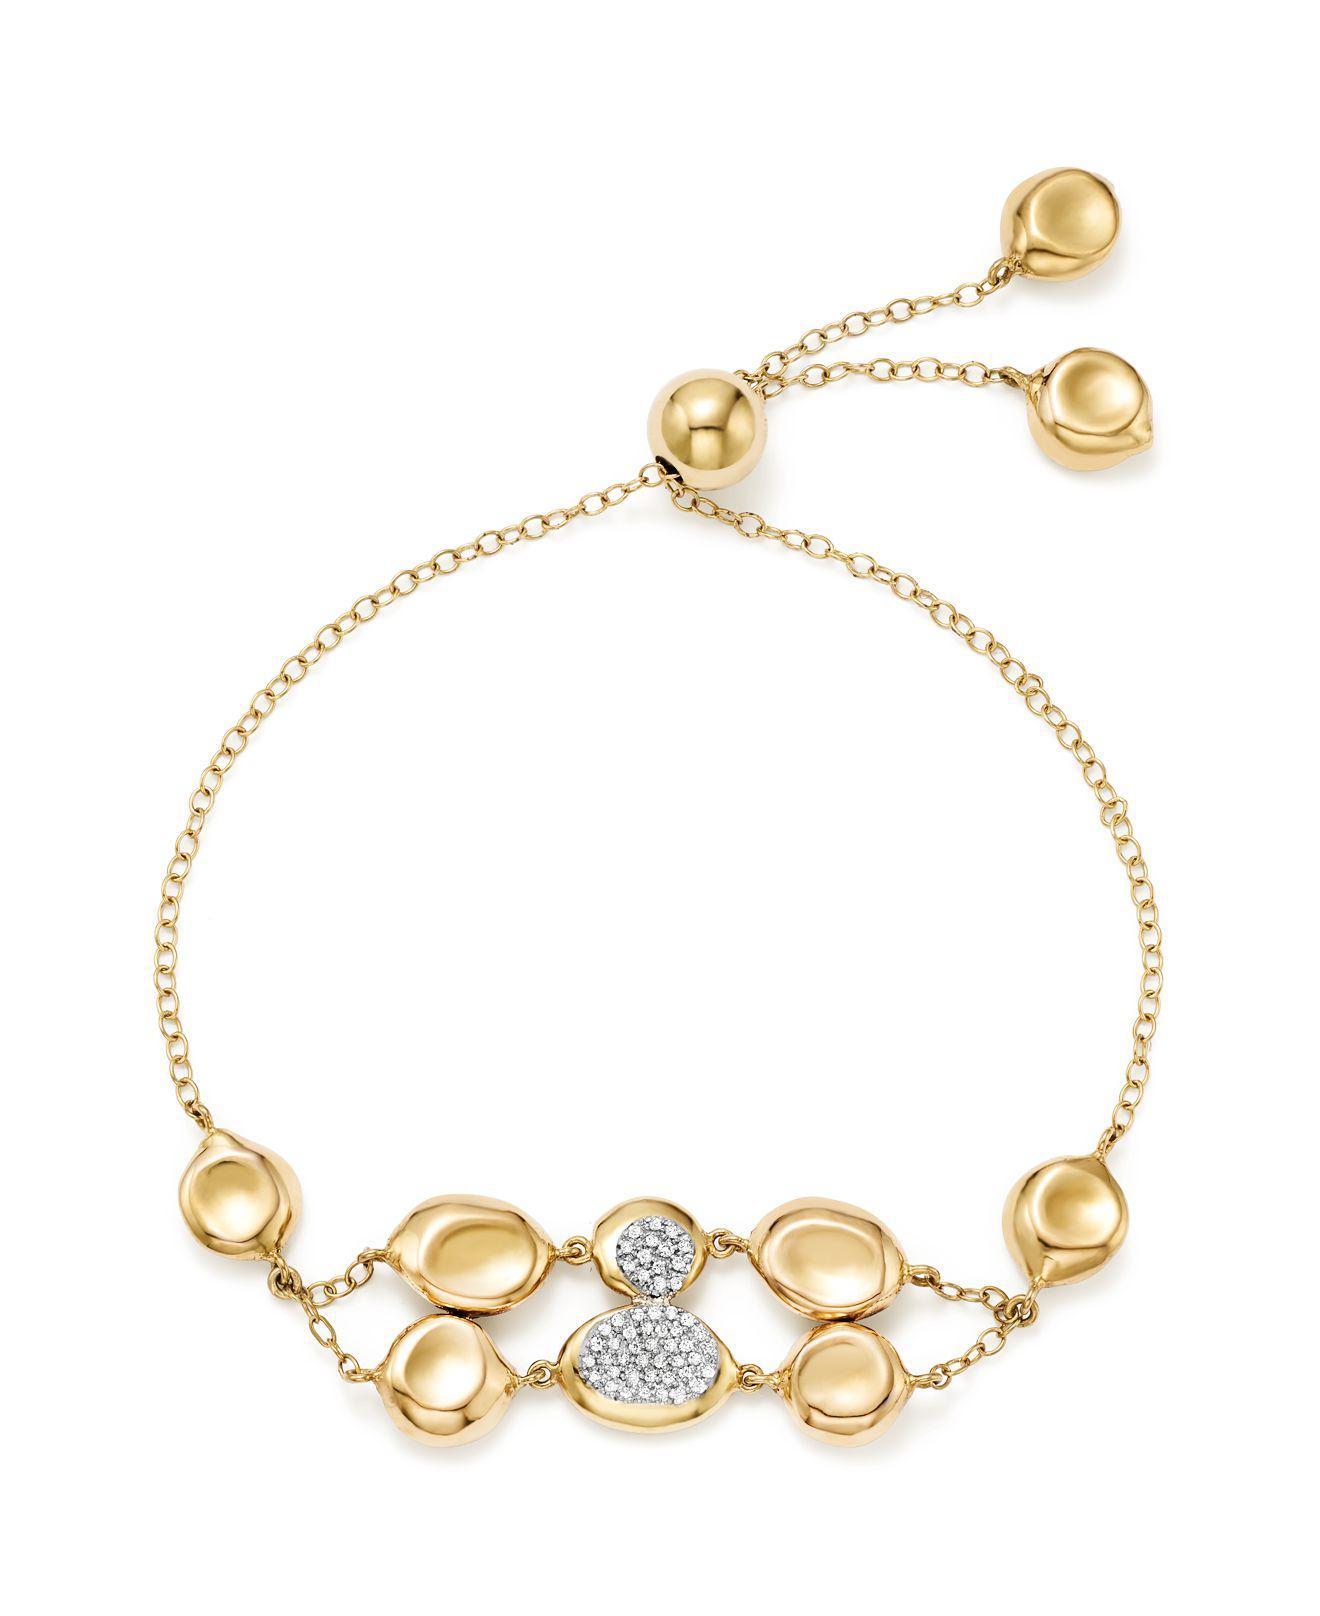 Ippolita Onda Chain Bracelet with Diamonds d0Bk5kWe